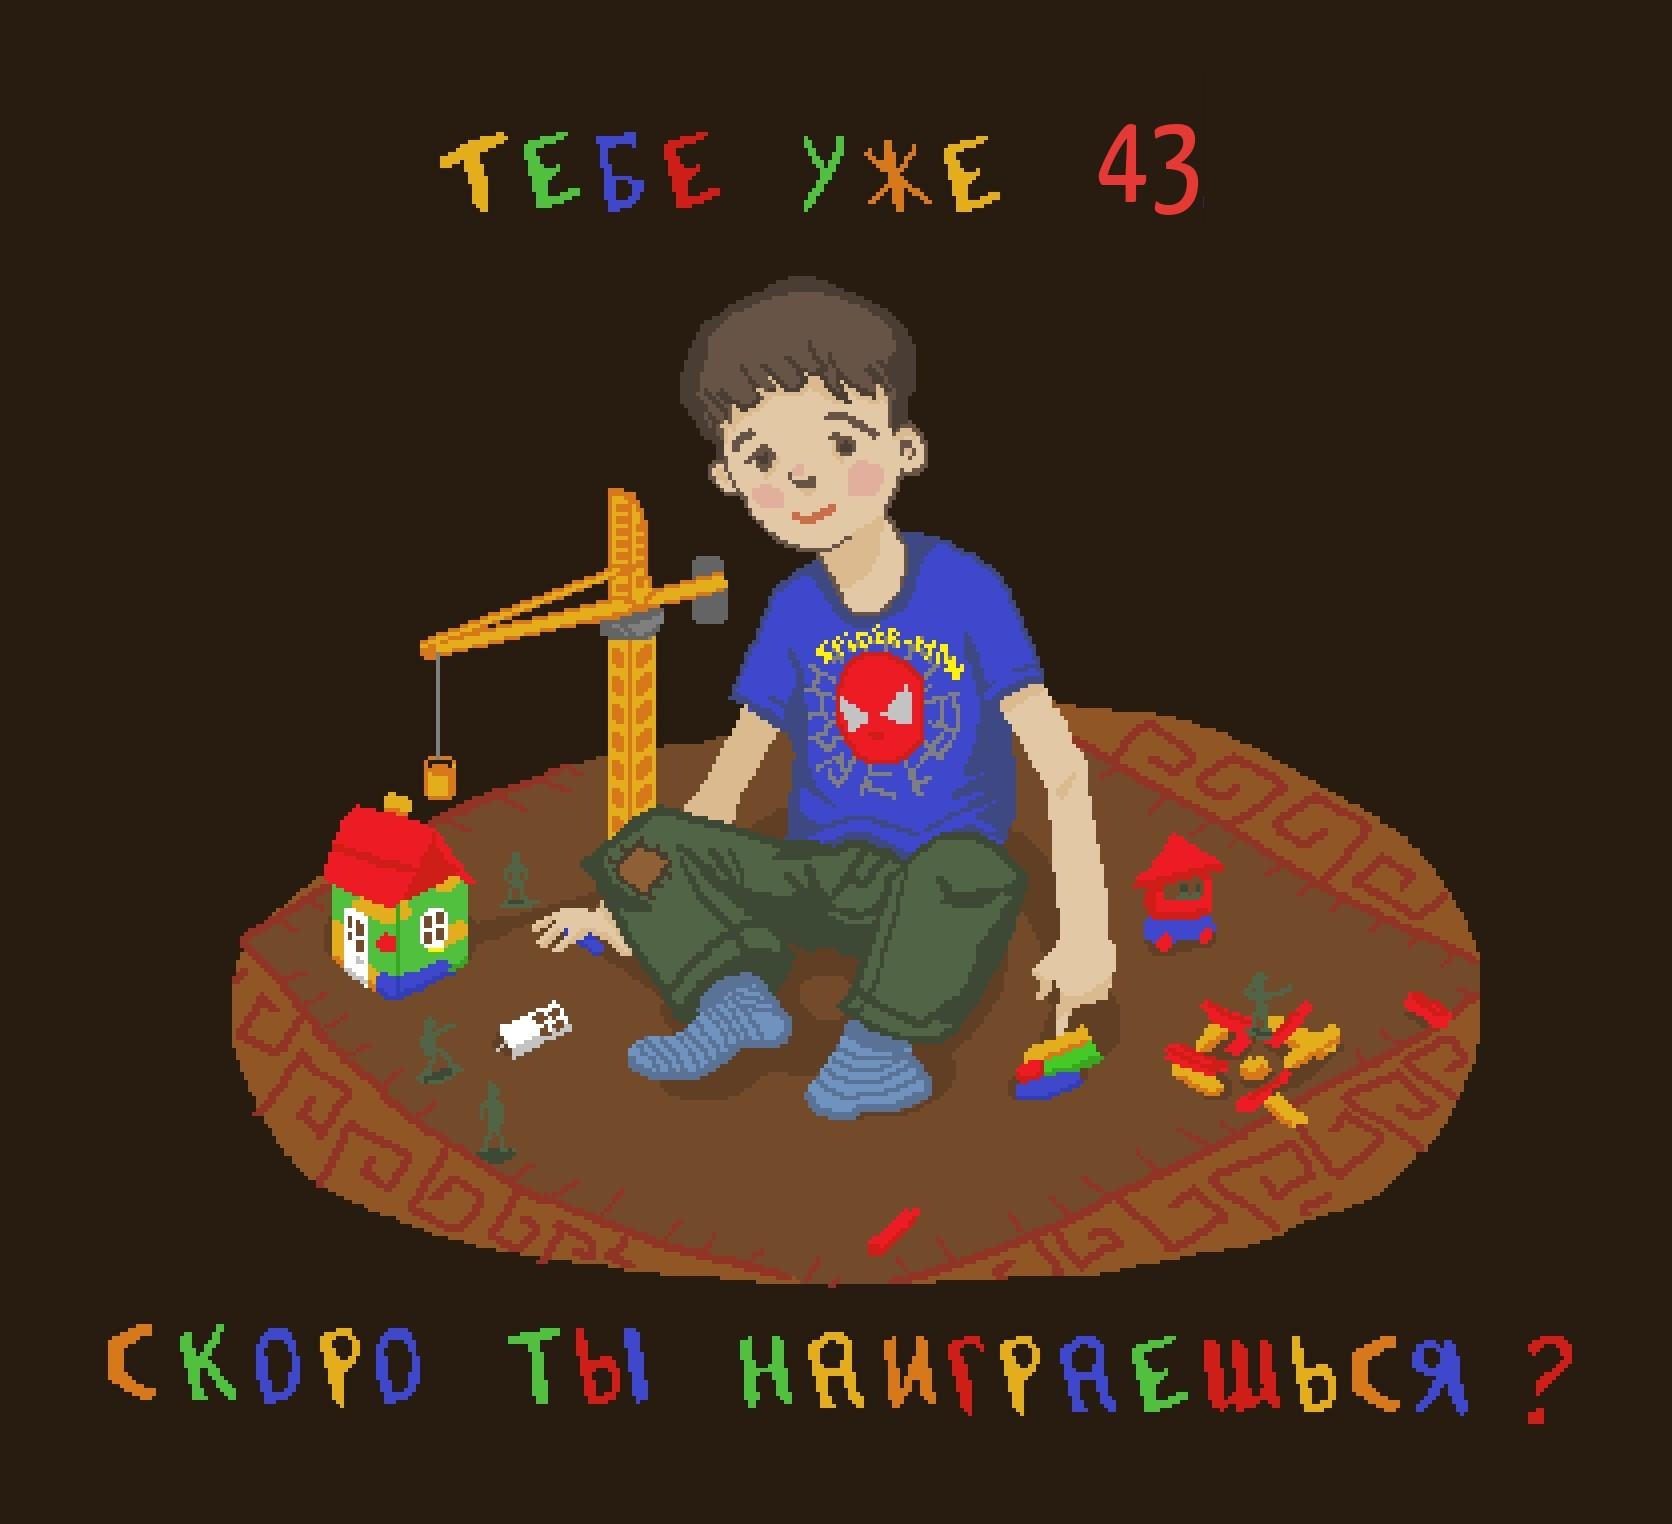 https://zxdemos.ru/uploads/images/2/8ff2f4b8688e7b9c55bda1f306725ee5.jpg